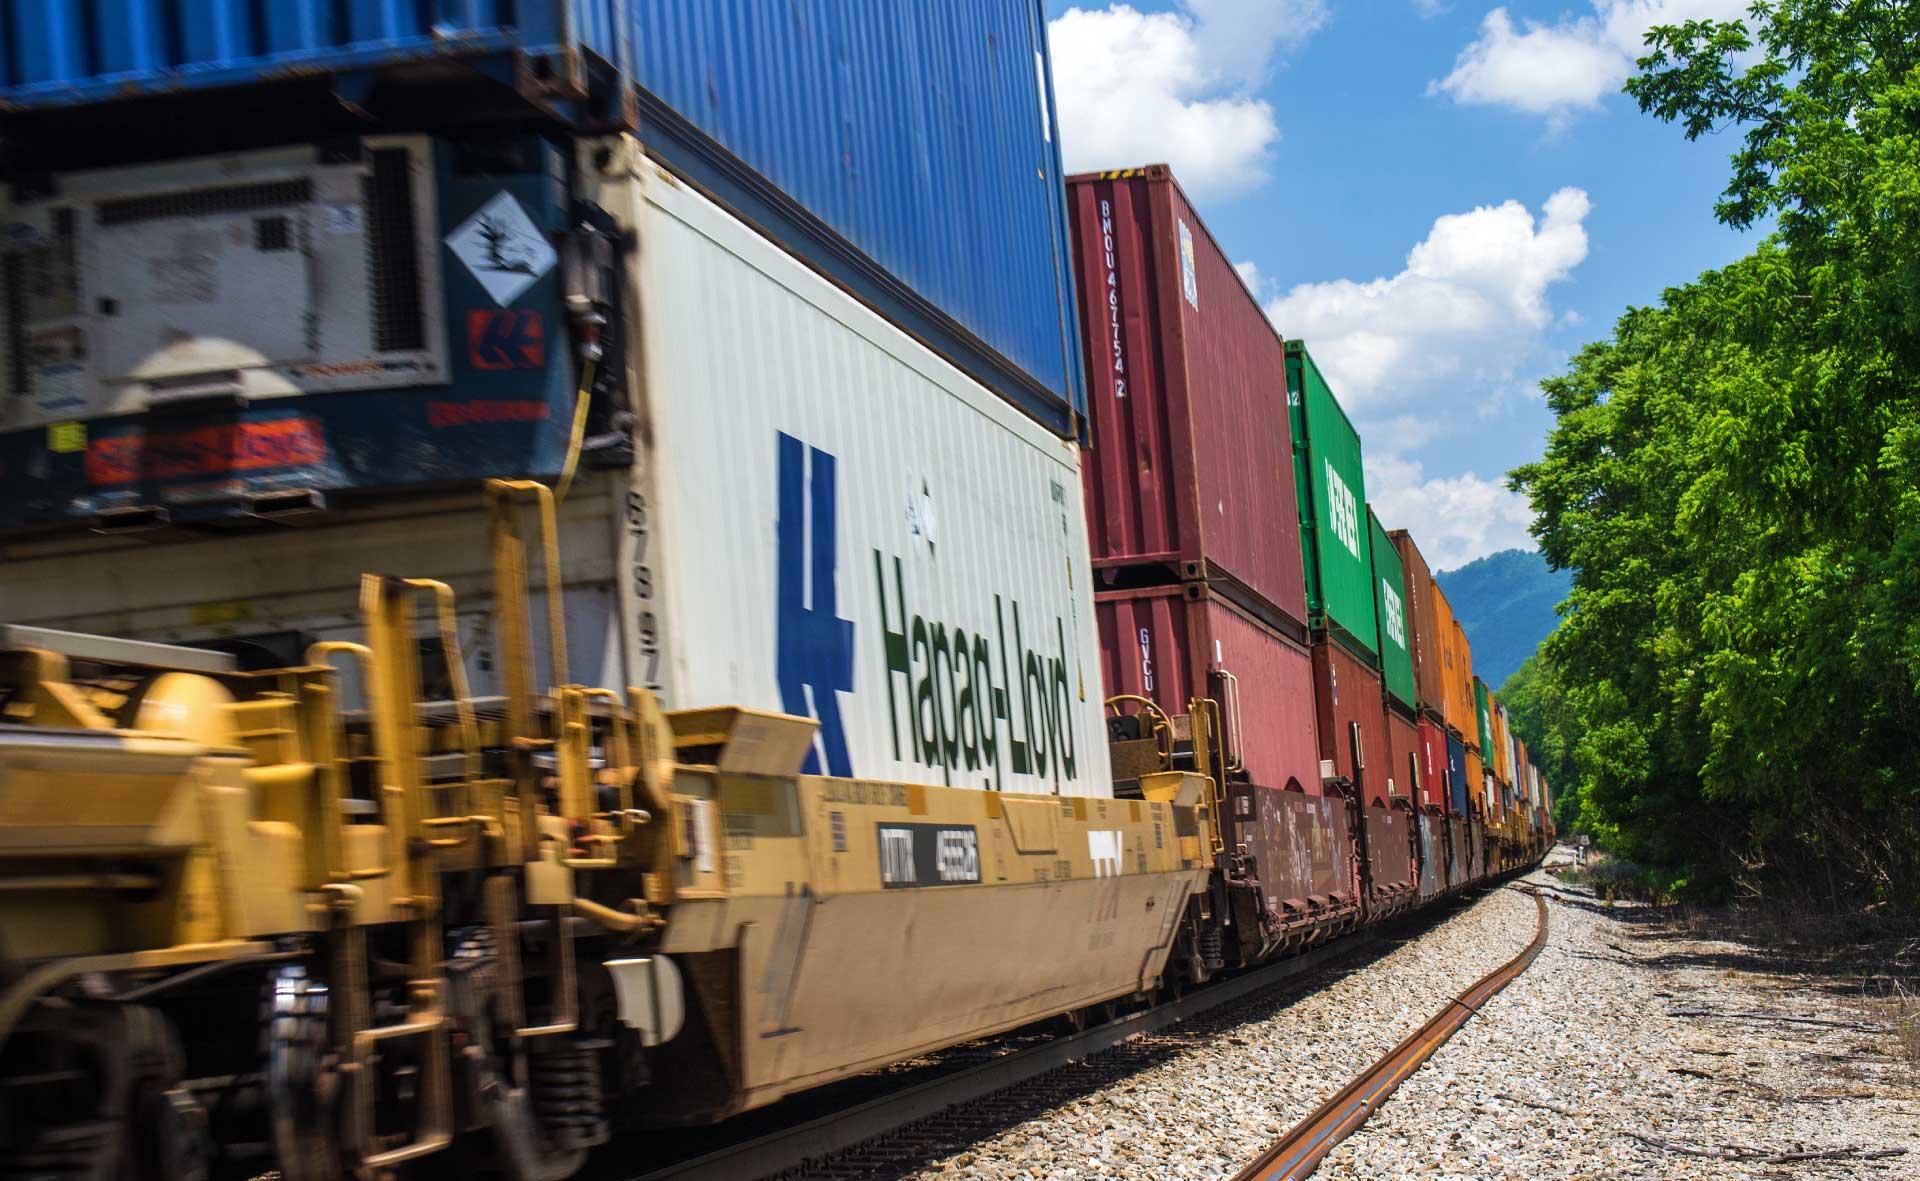 Railcar bulk liquid tank service